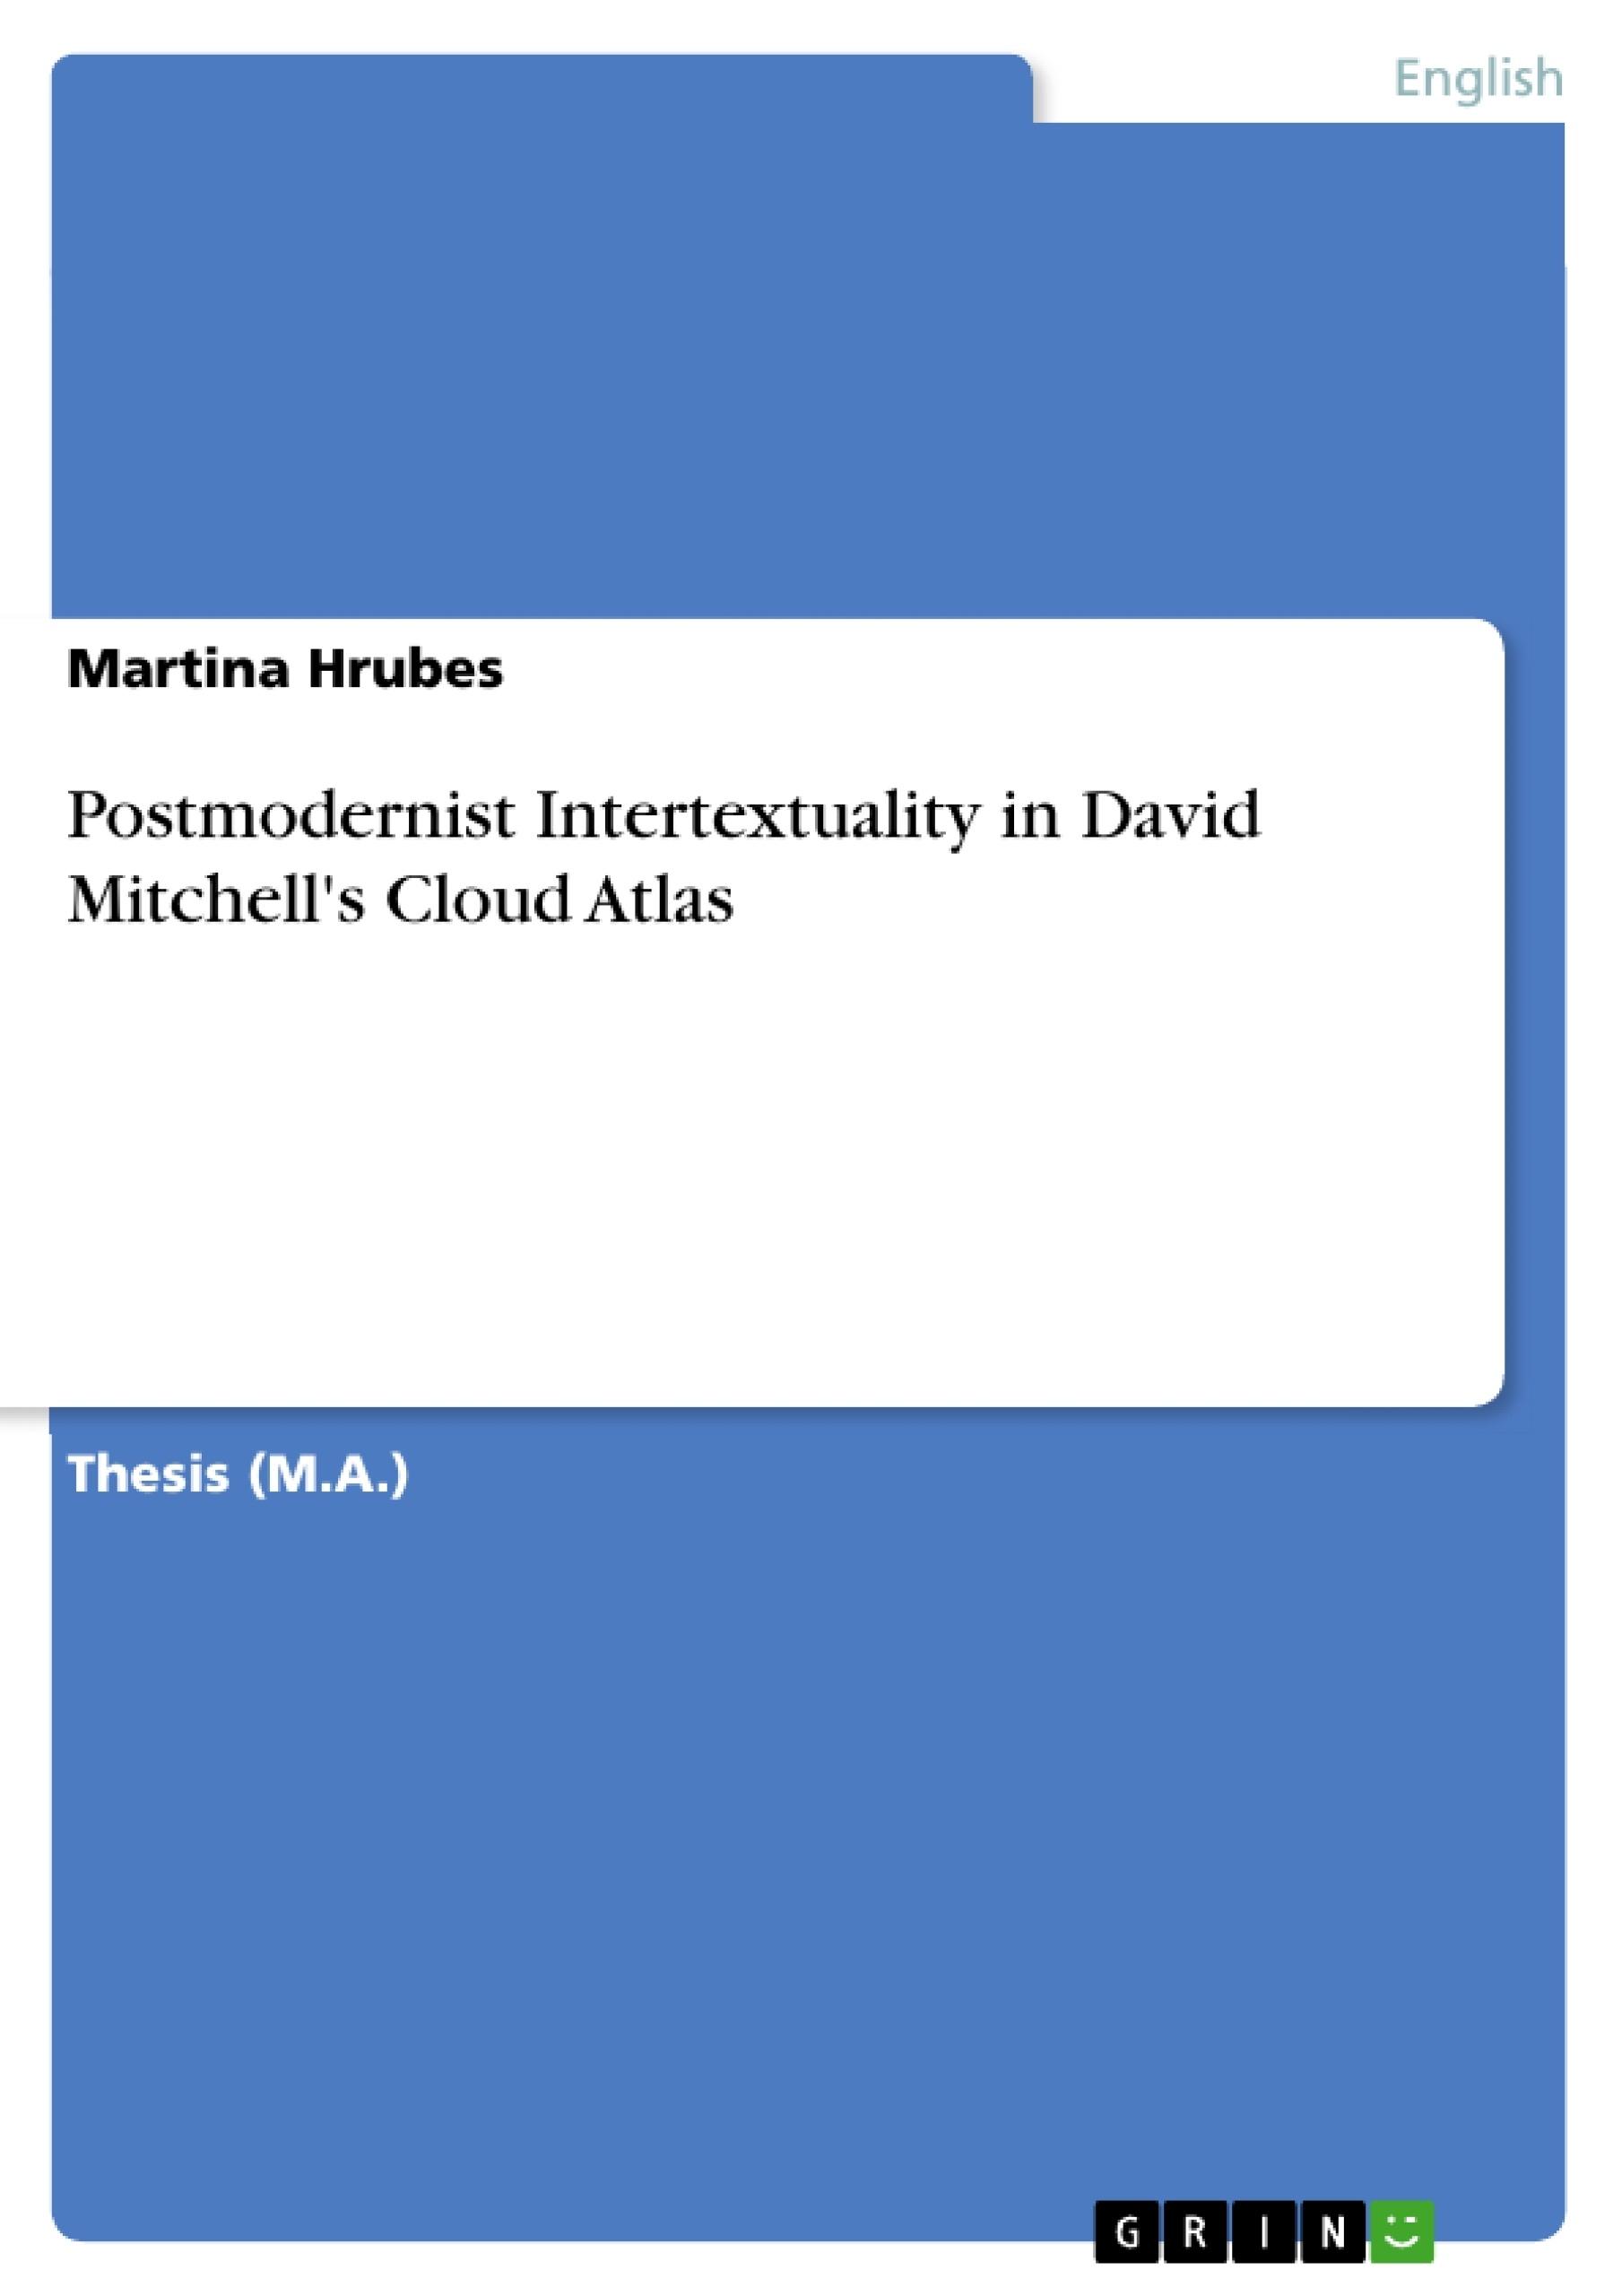 Title: Postmodernist Intertextuality in David Mitchell's Cloud Atlas